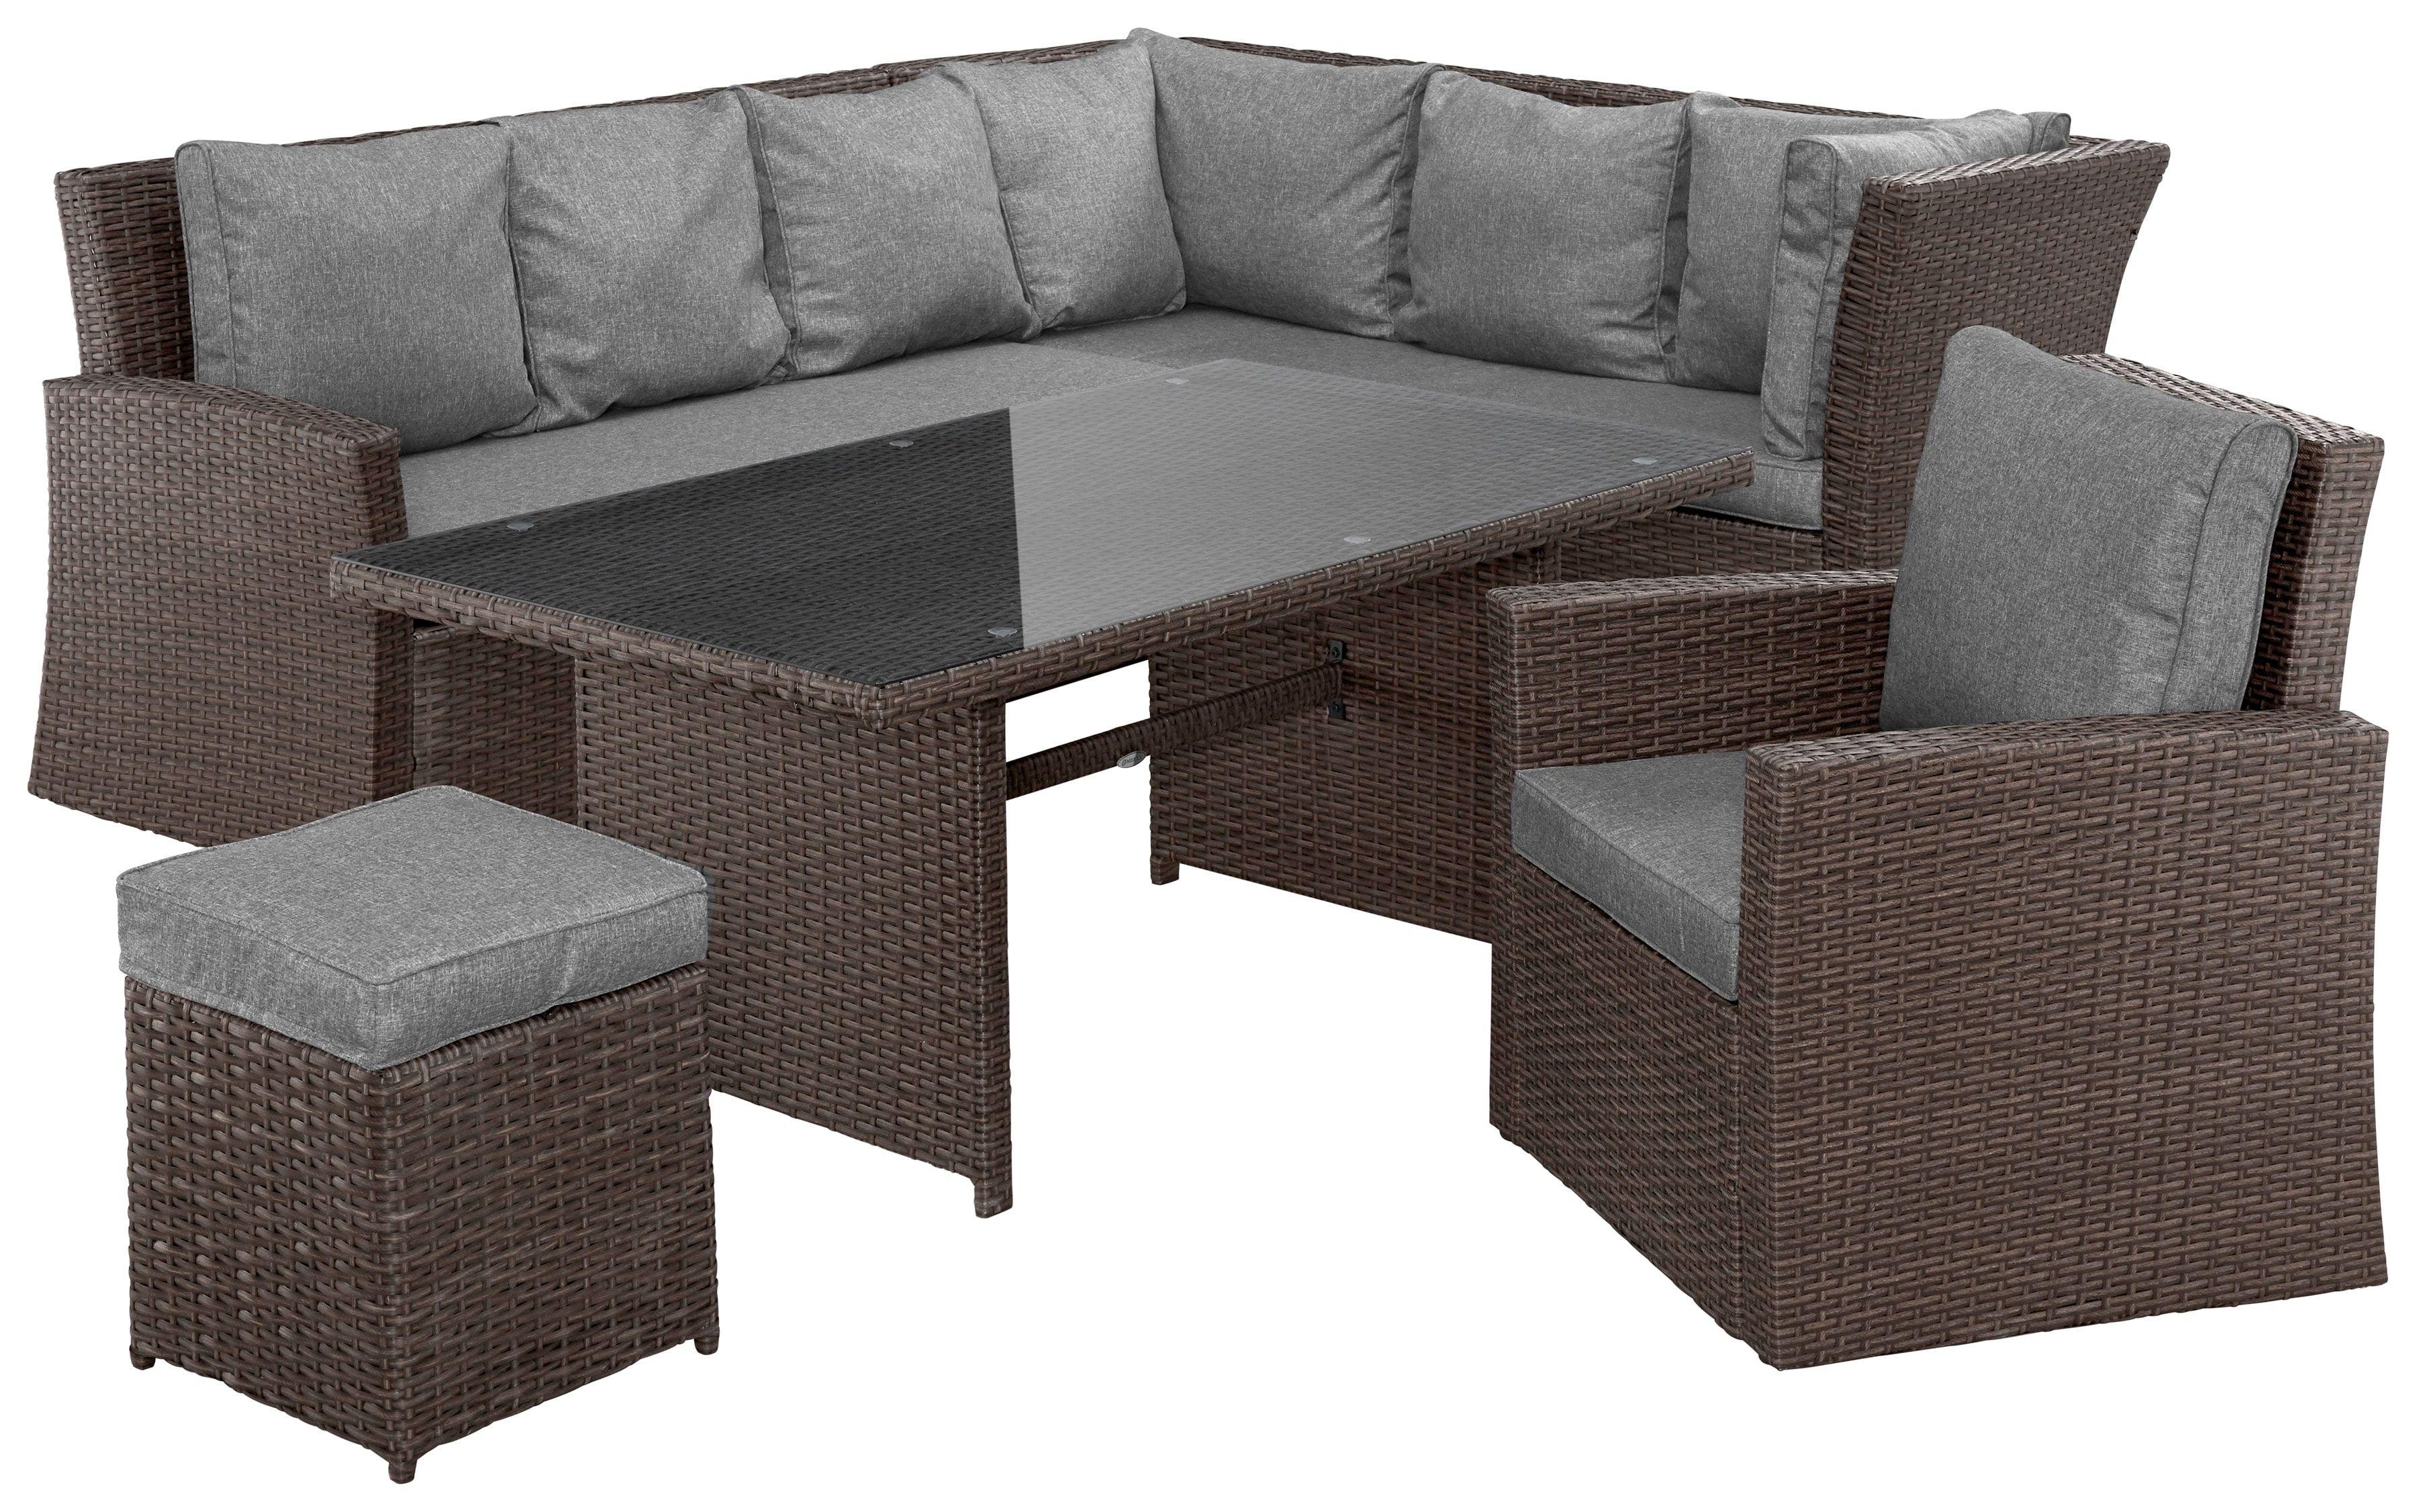 Baur Gartenmobel Polyrattan In 2021 Outdoor Furniture Sets Home Decor Furniture Sets